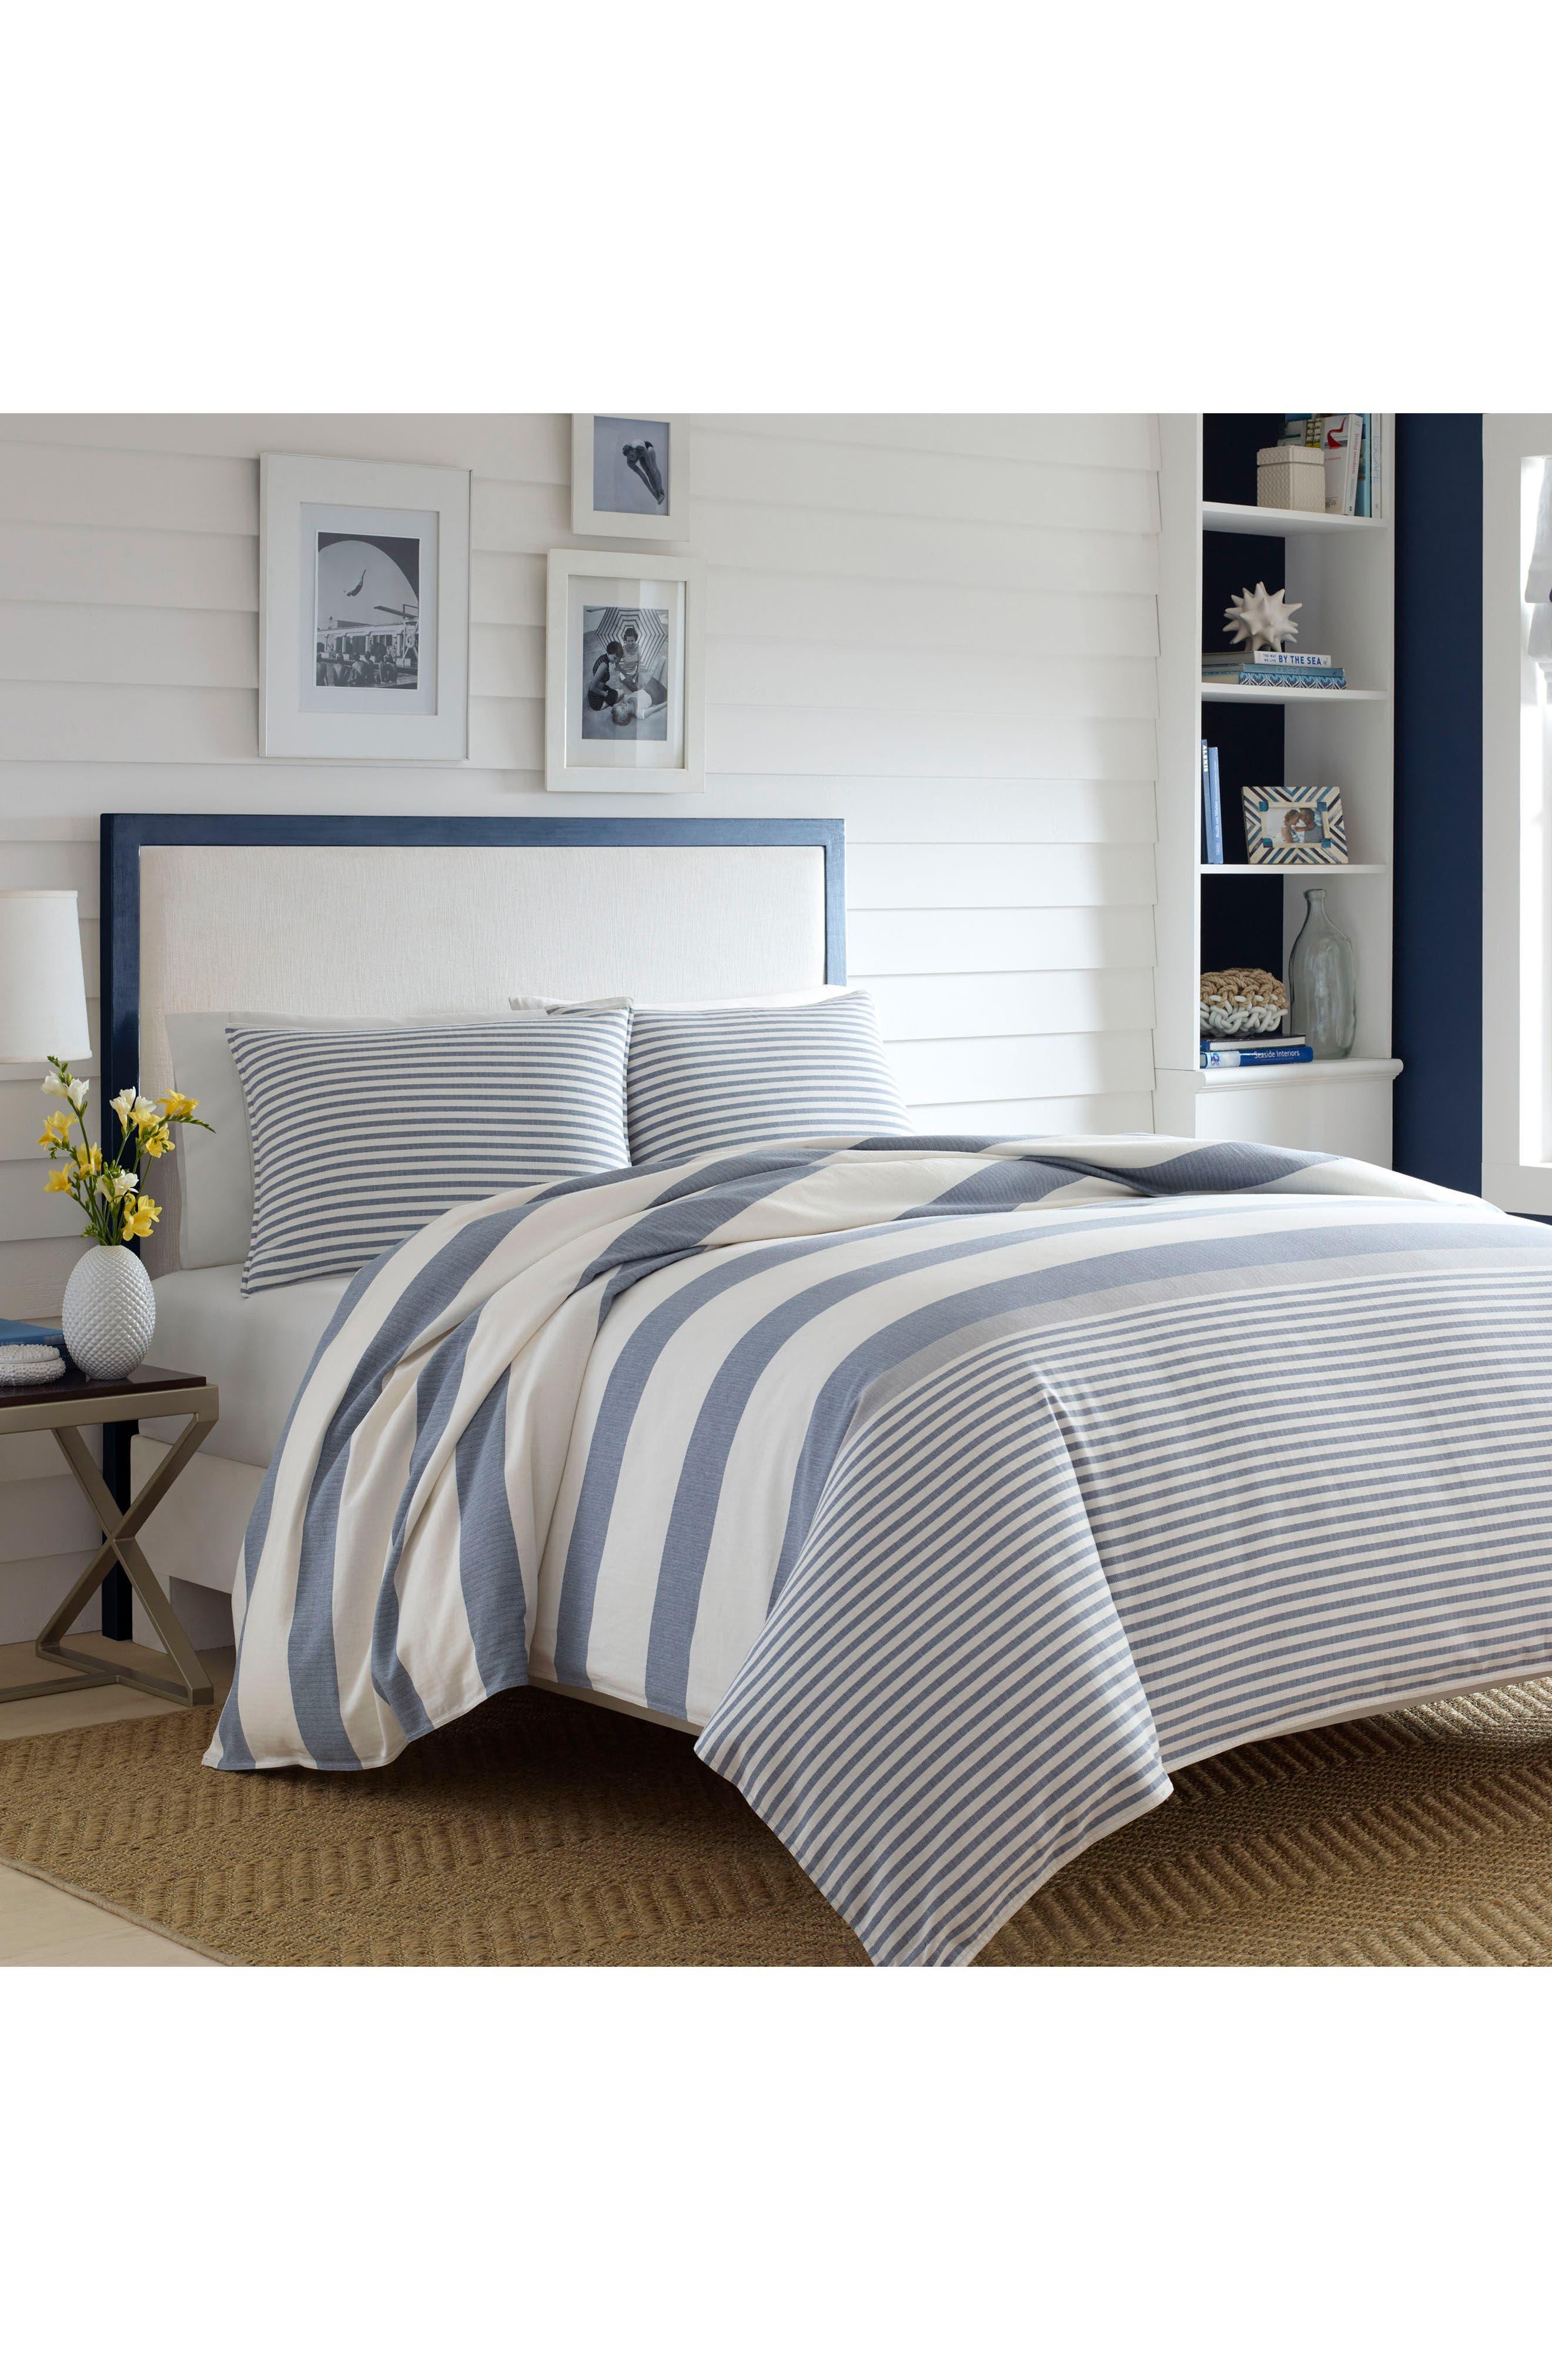 Main Image - Nautica Fairwater Comforter & Sham Set